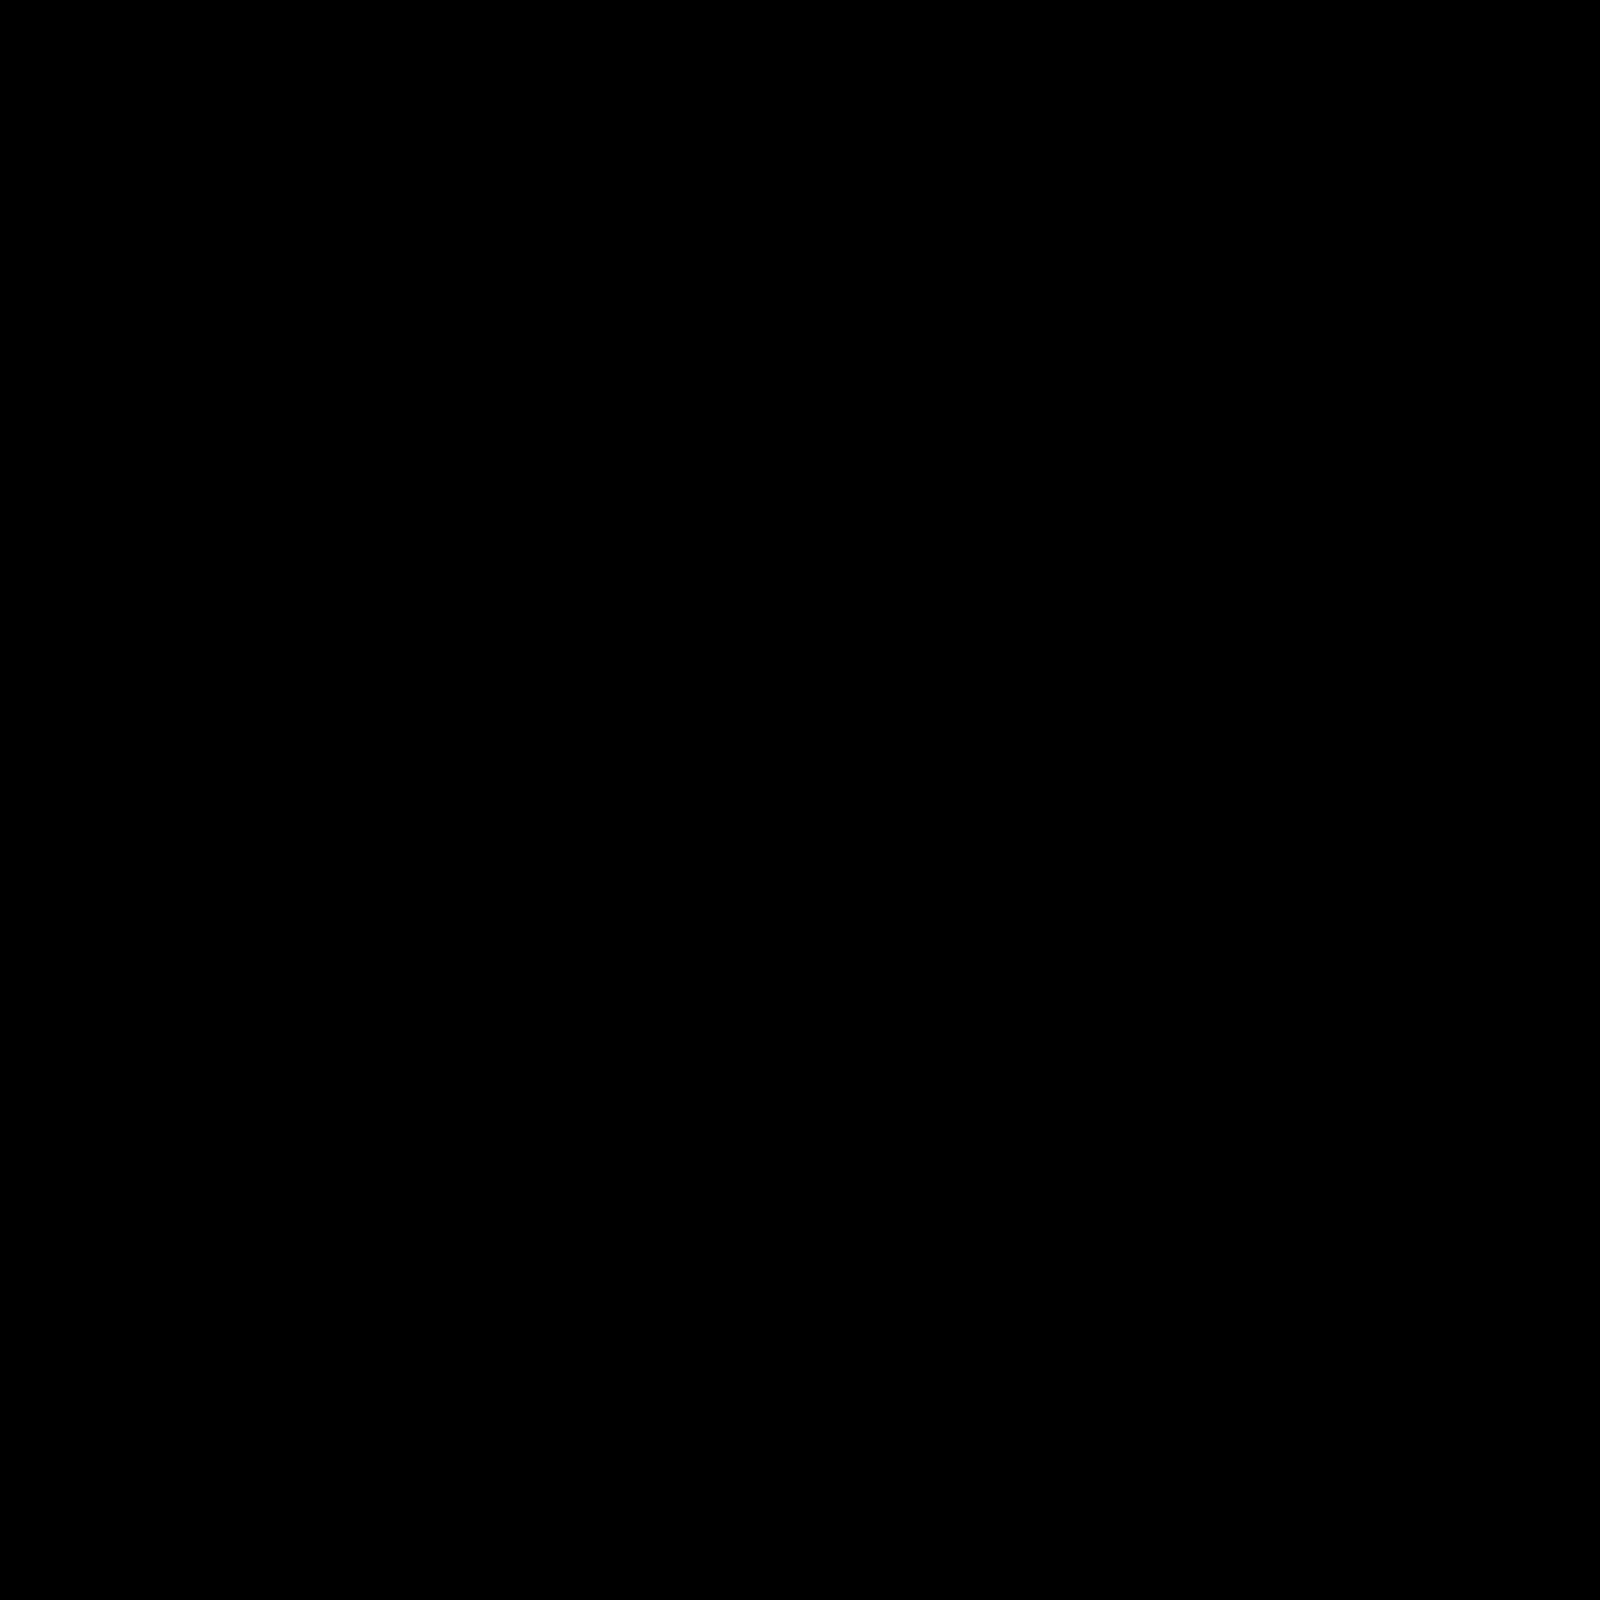 Radio 2 icon